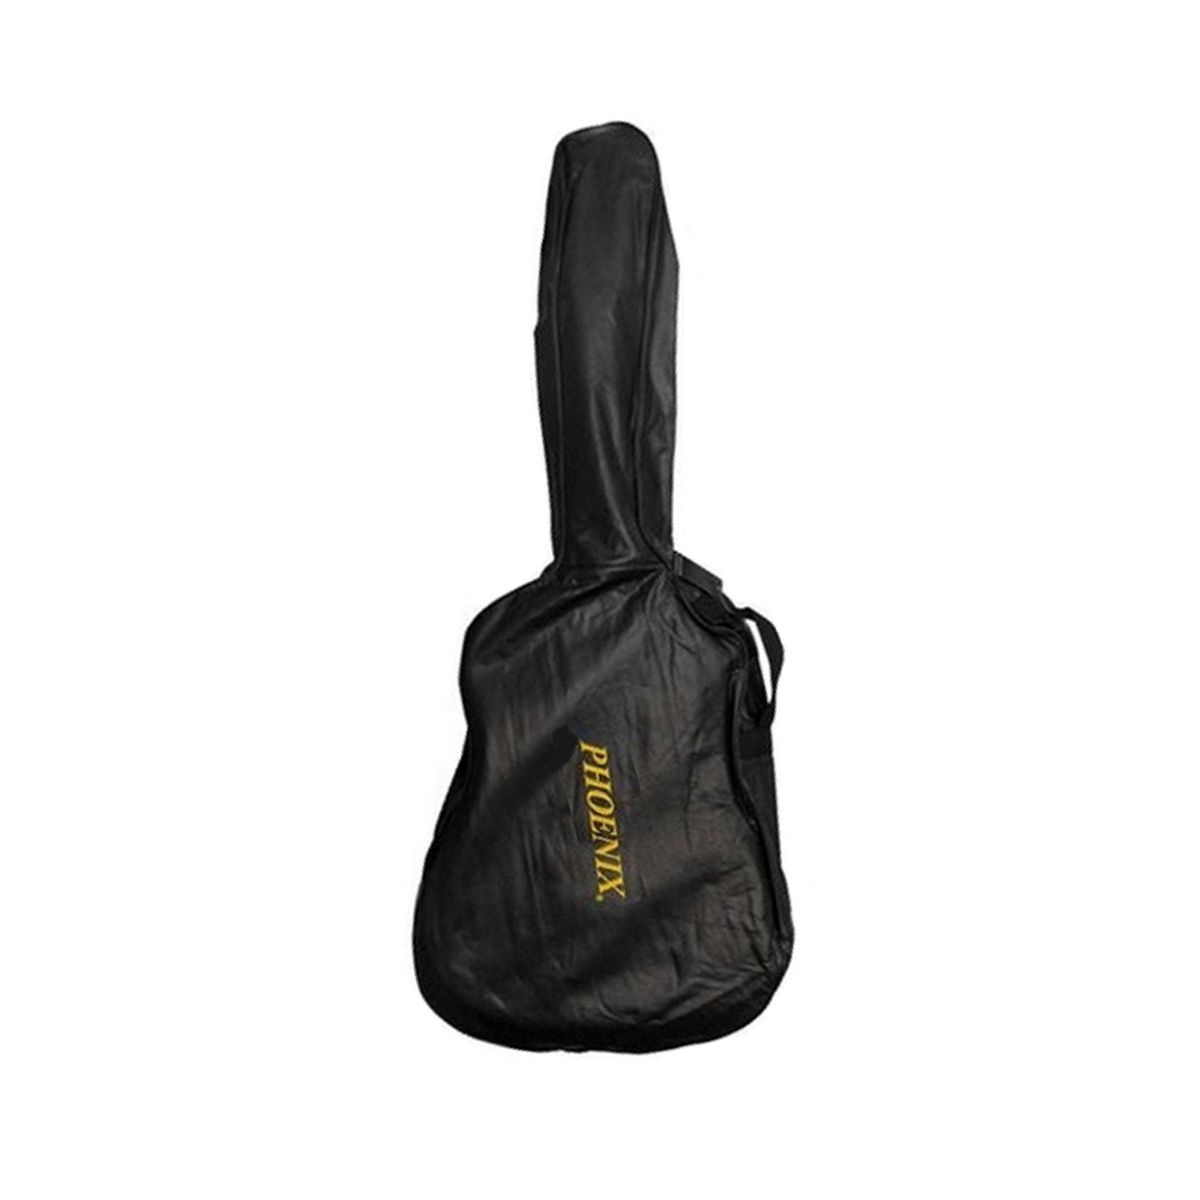 Bag Capa Courino Simples Phx PAA013 Preta para Contrabaixo